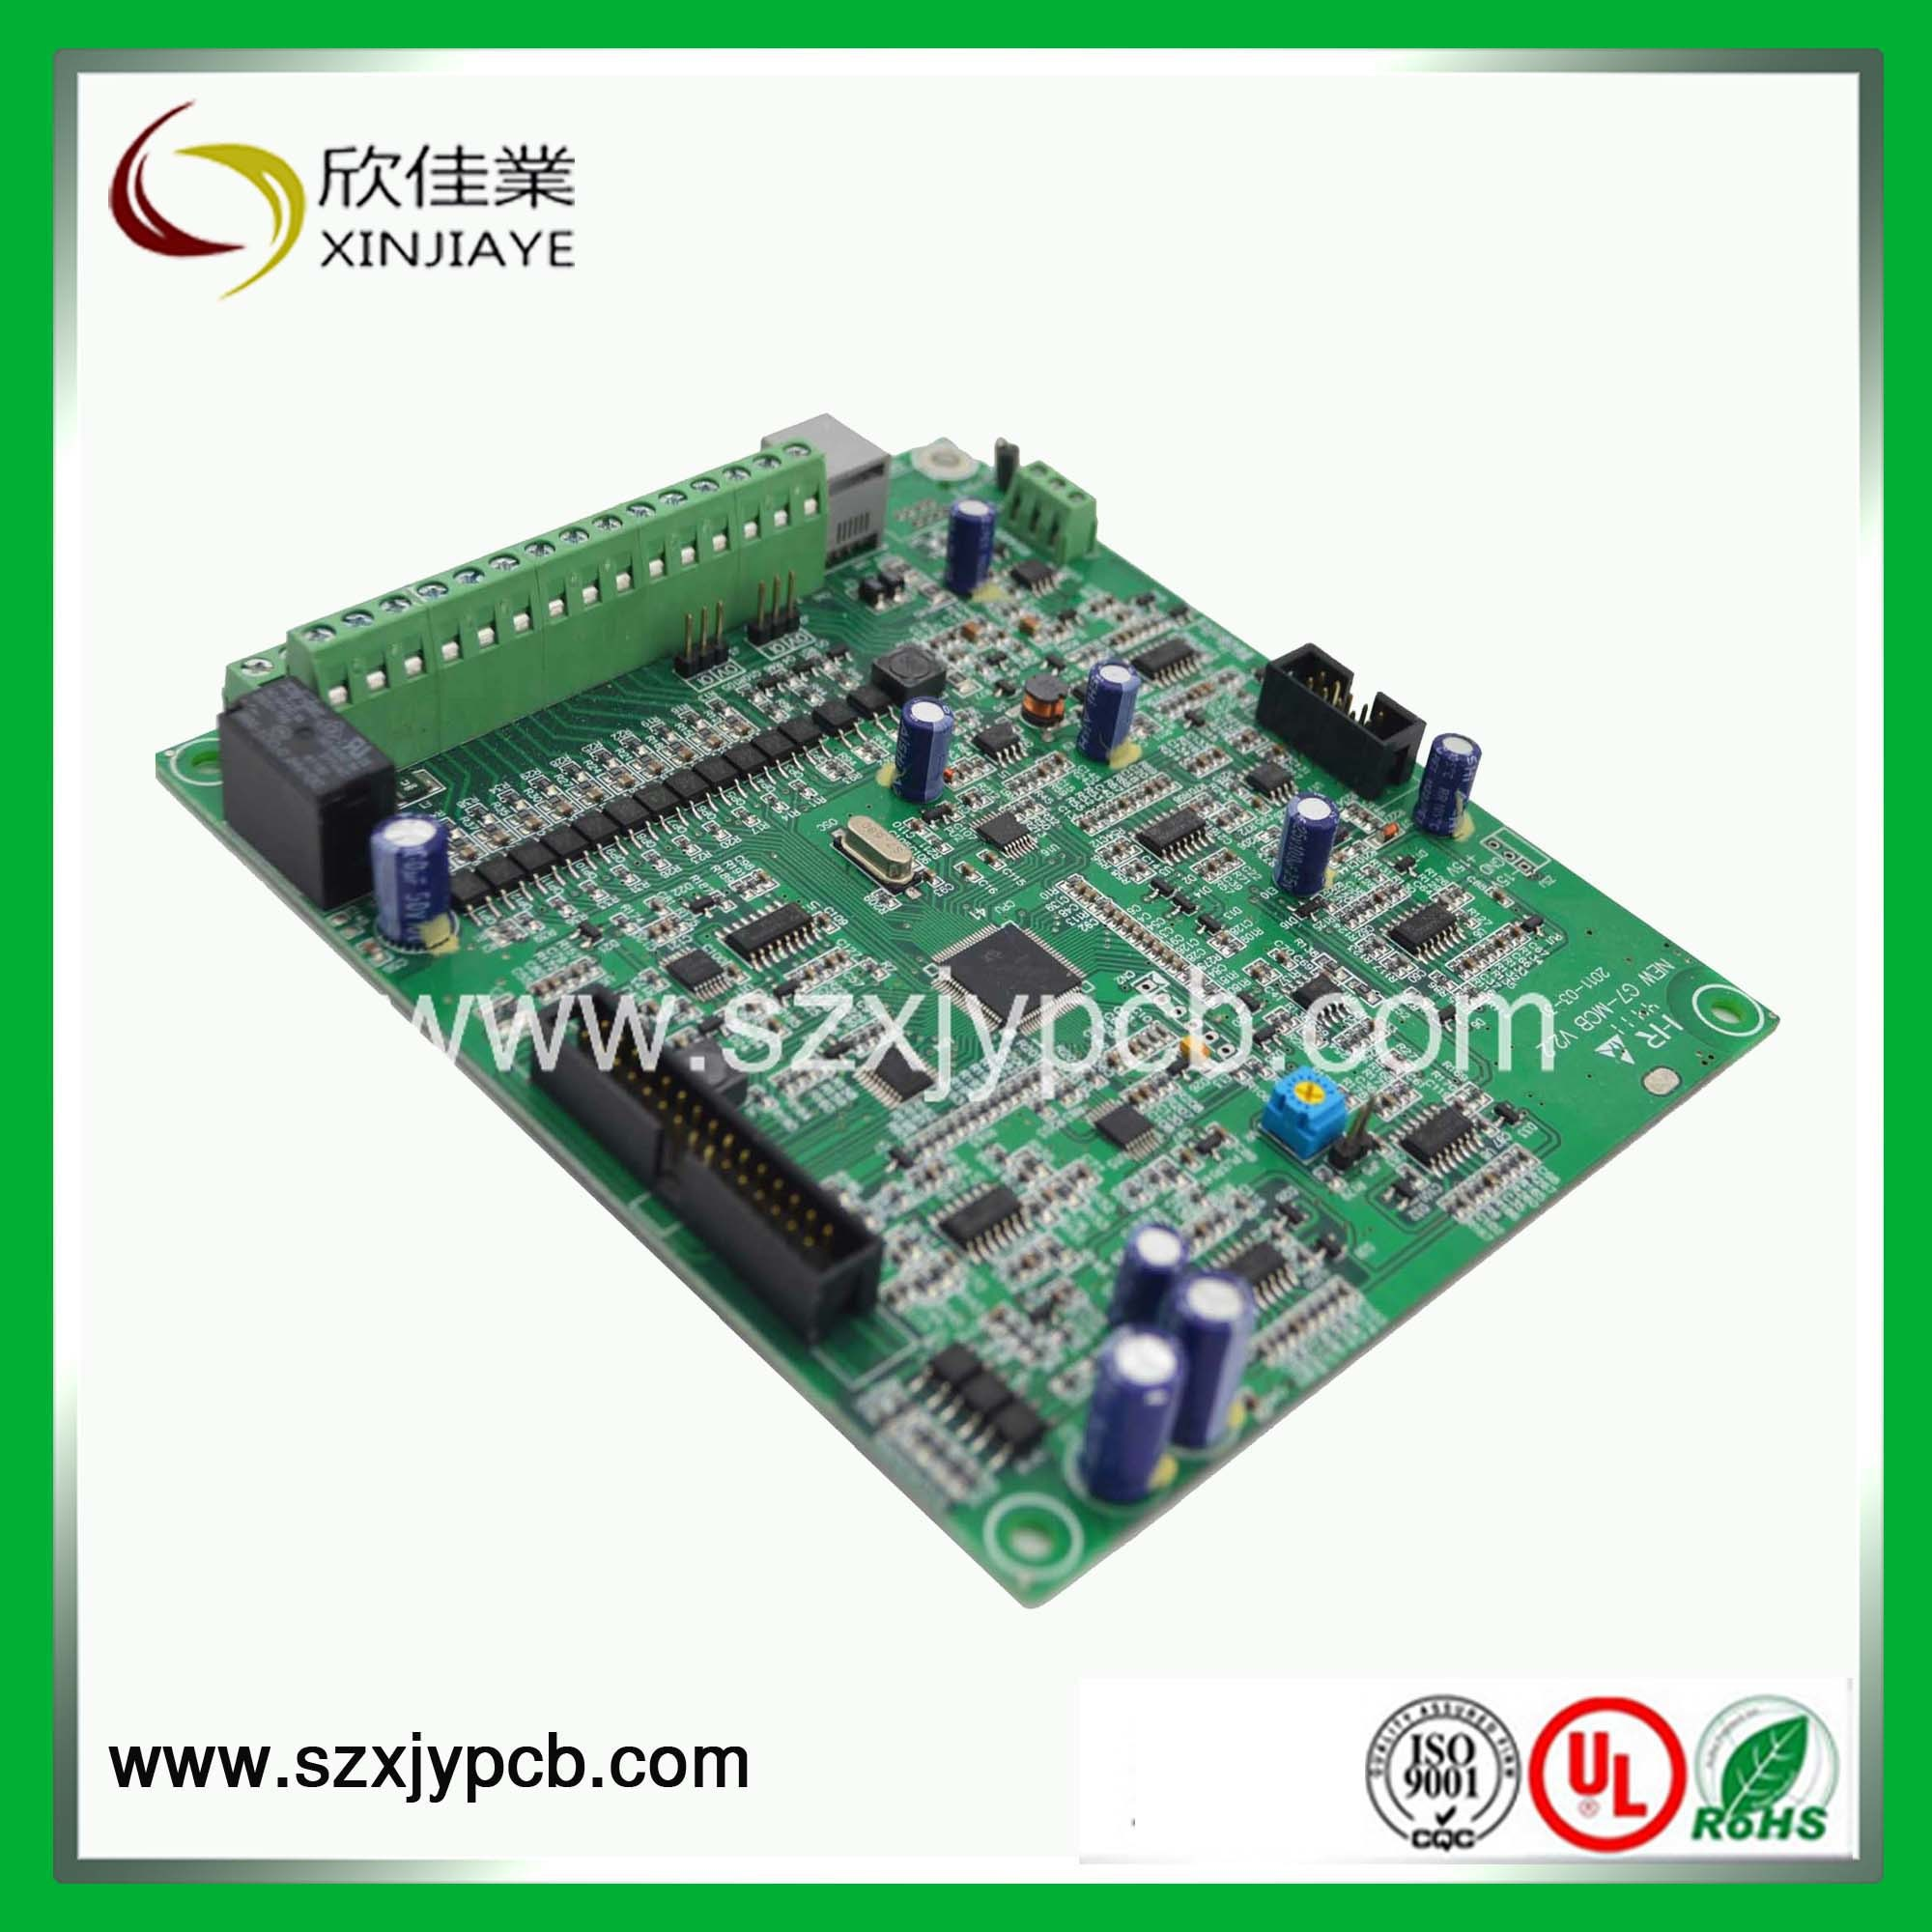 China Automatic Pcb Assembly Pcba Board Smd Assemly Shenzhen Oem Electronic Printed Circuit Manufacturerpcb